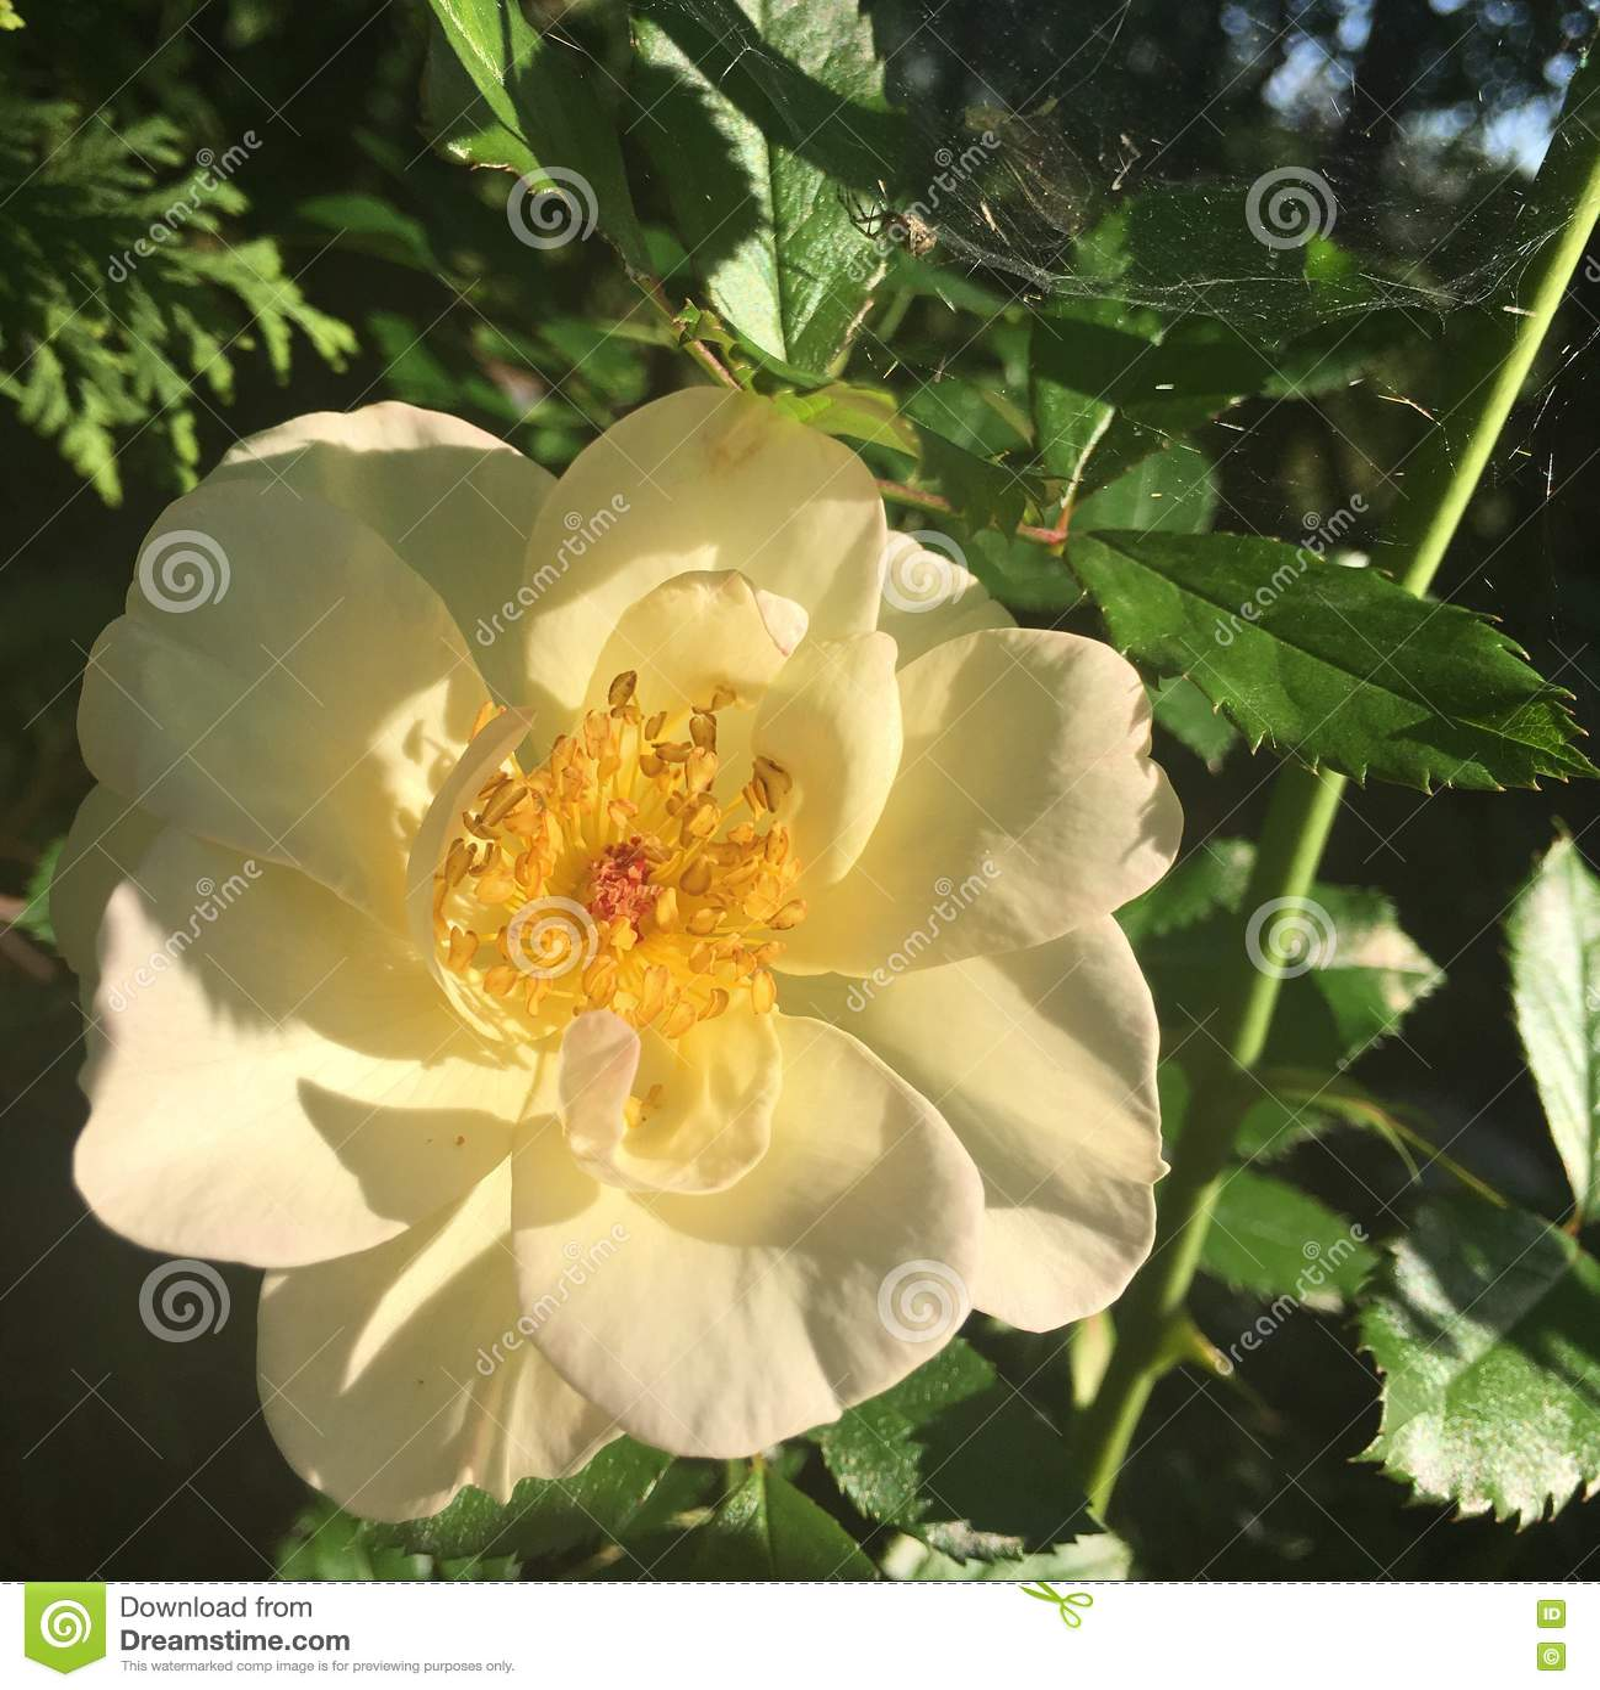 Oscar Peterson rose in sunlight